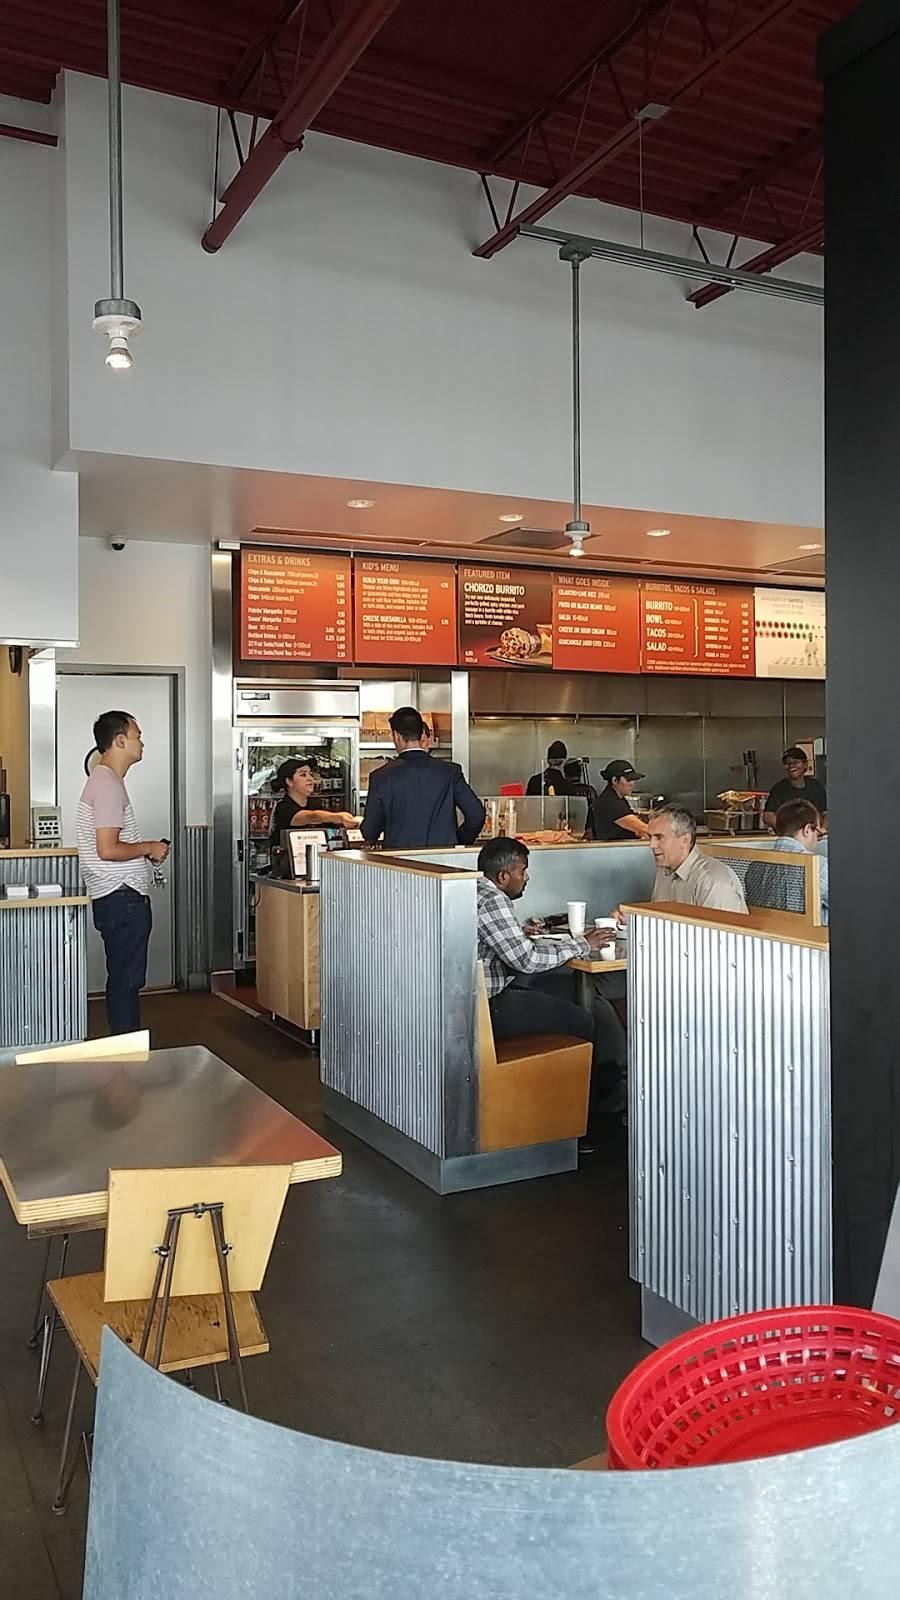 Chipotle Mexican Grill   restaurant   1572 E Lake Cook Rd, Wheeling, IL 60090, USA   8475206353 OR +1 847-520-6353